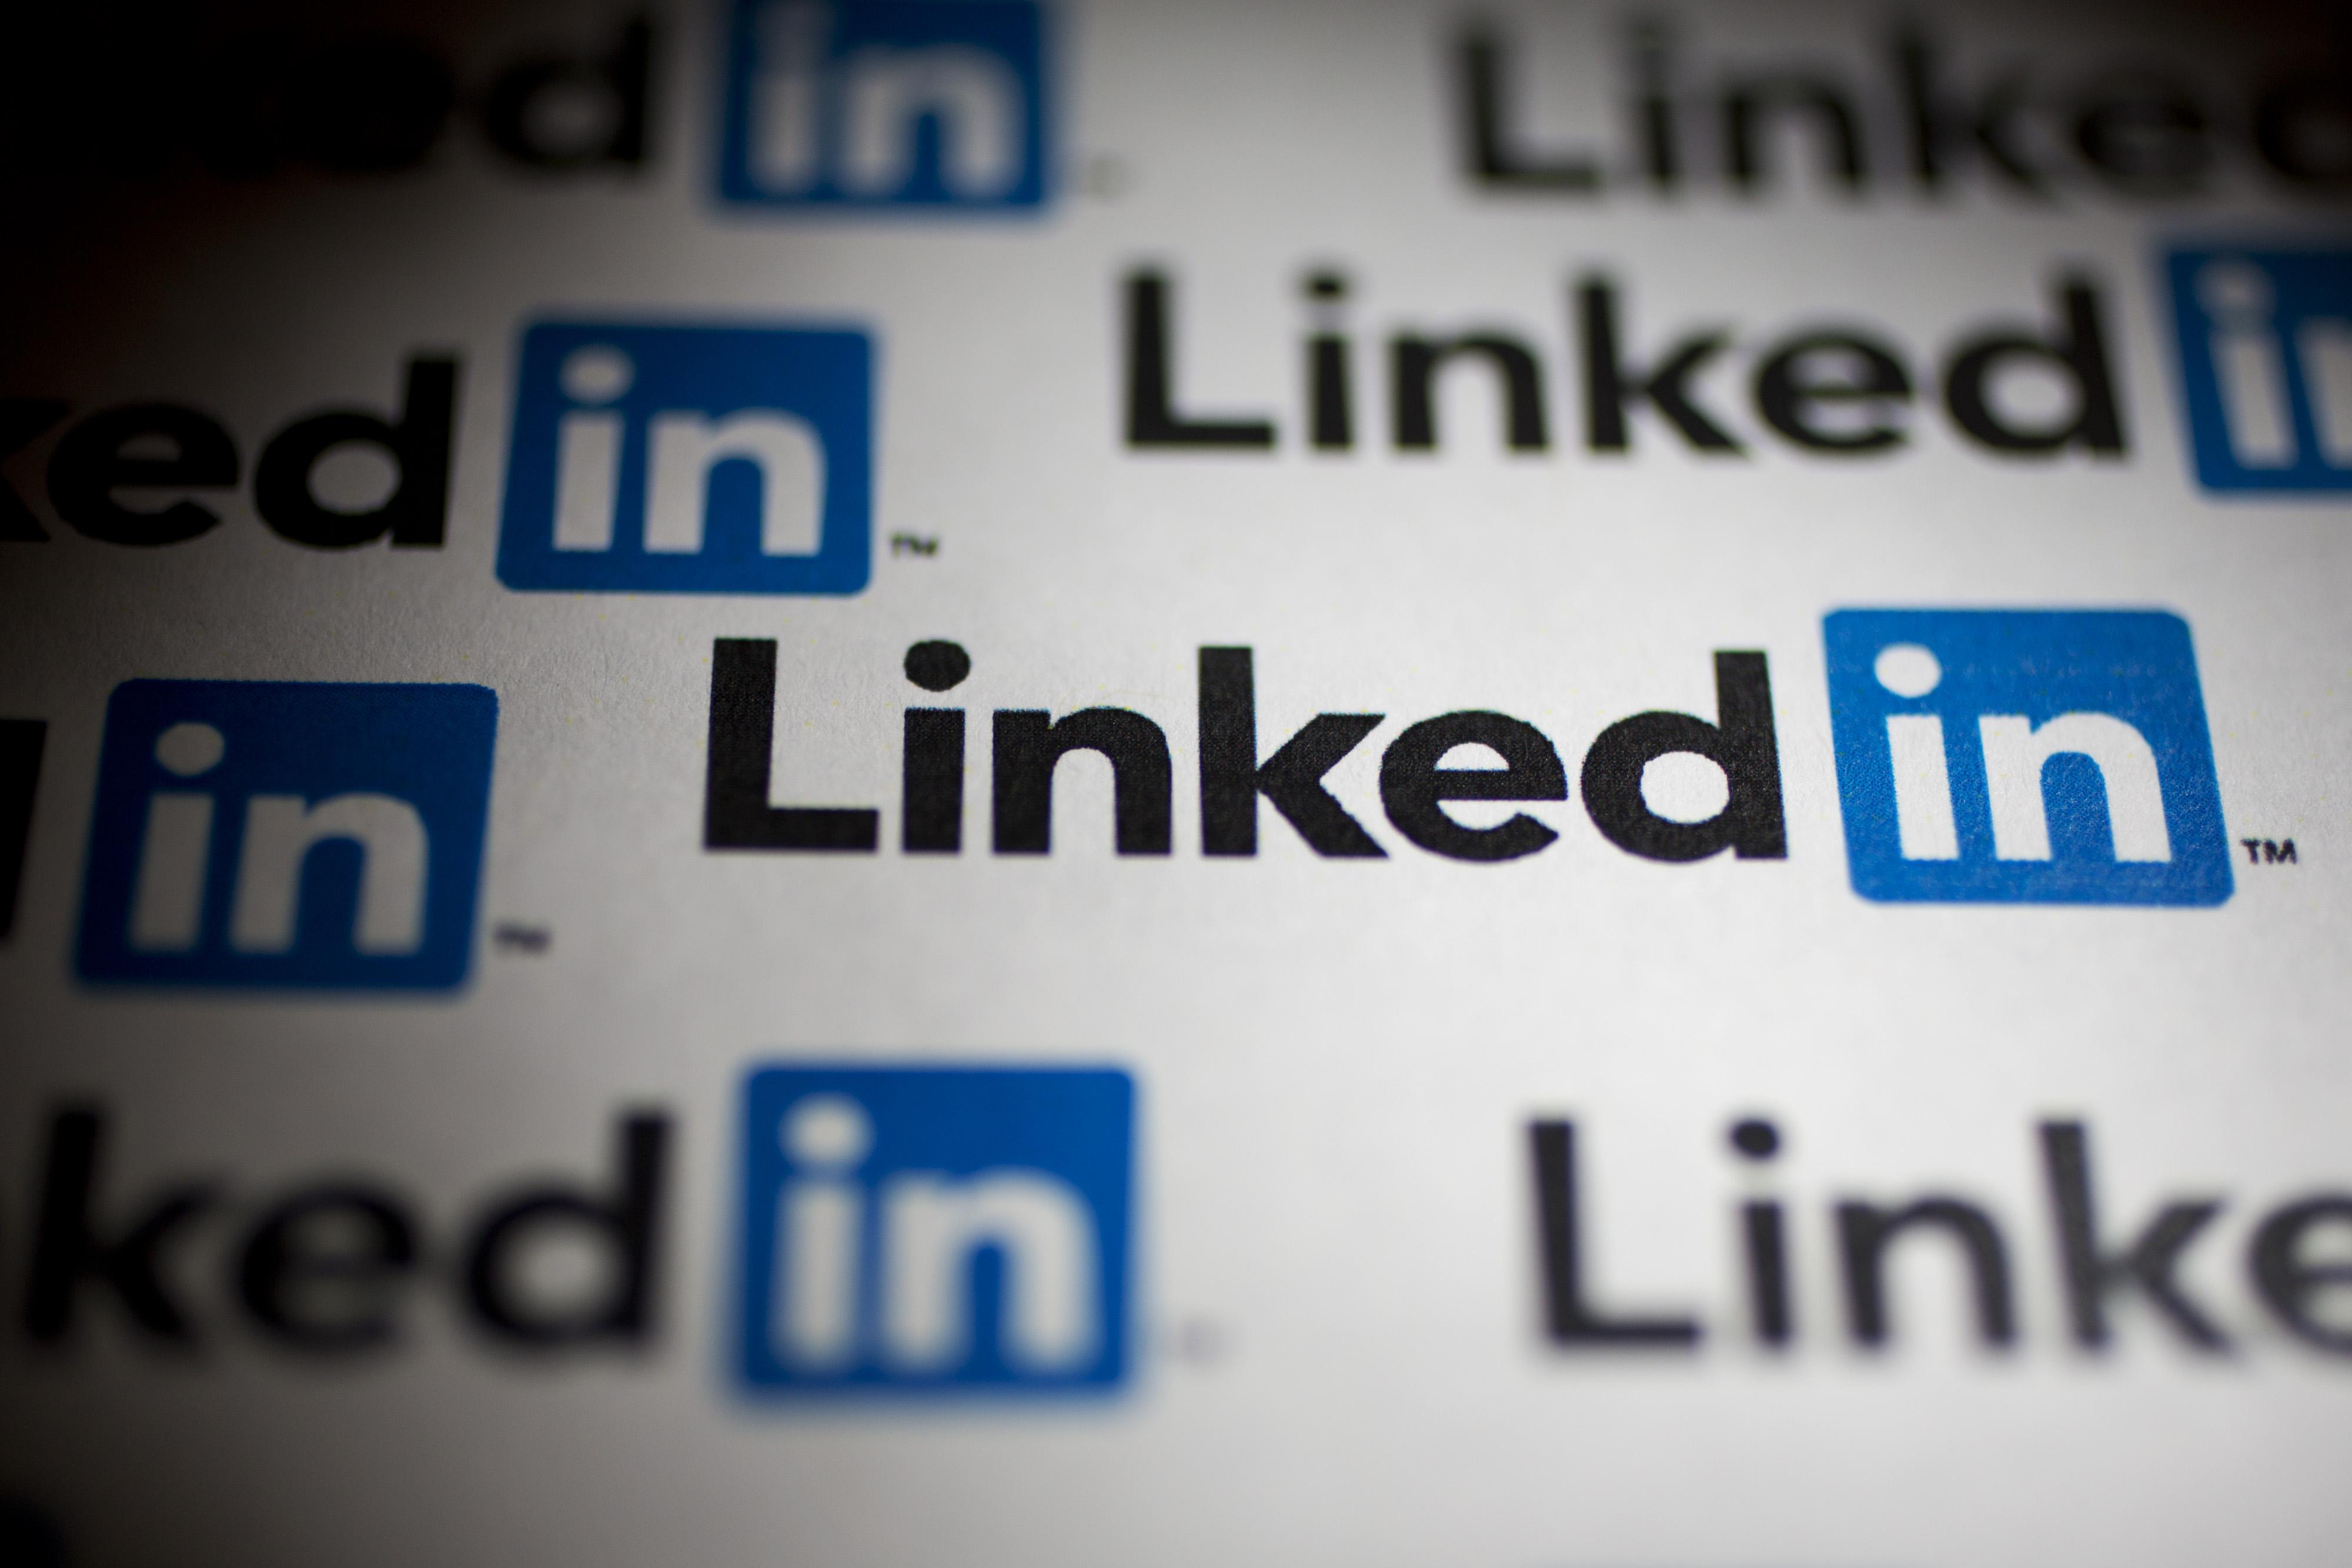 LinkedIn logos.